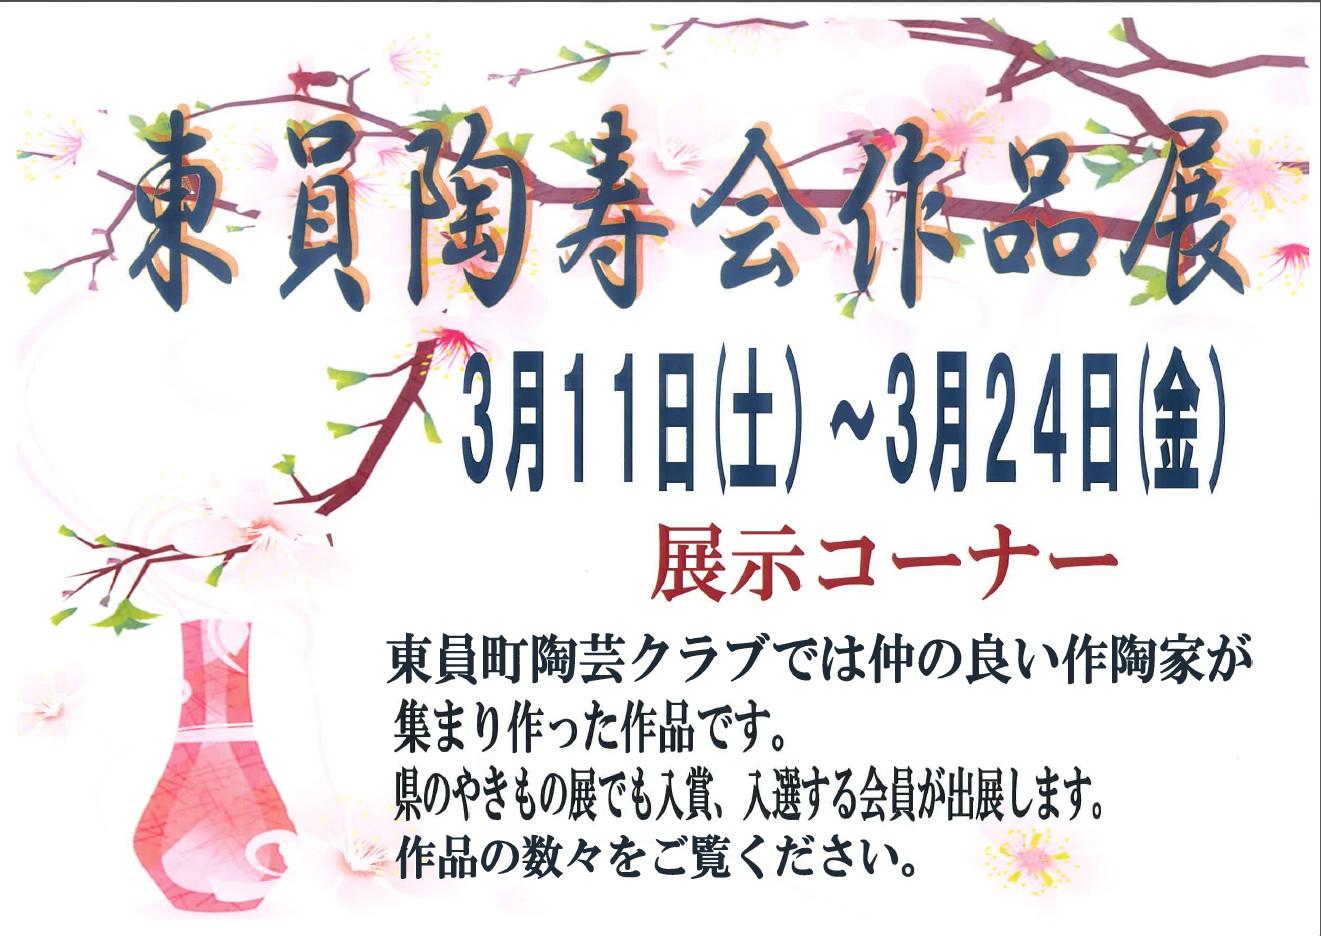 http://www.ajisainosato.com/info/images/2017y03m08d_200721742.jpg